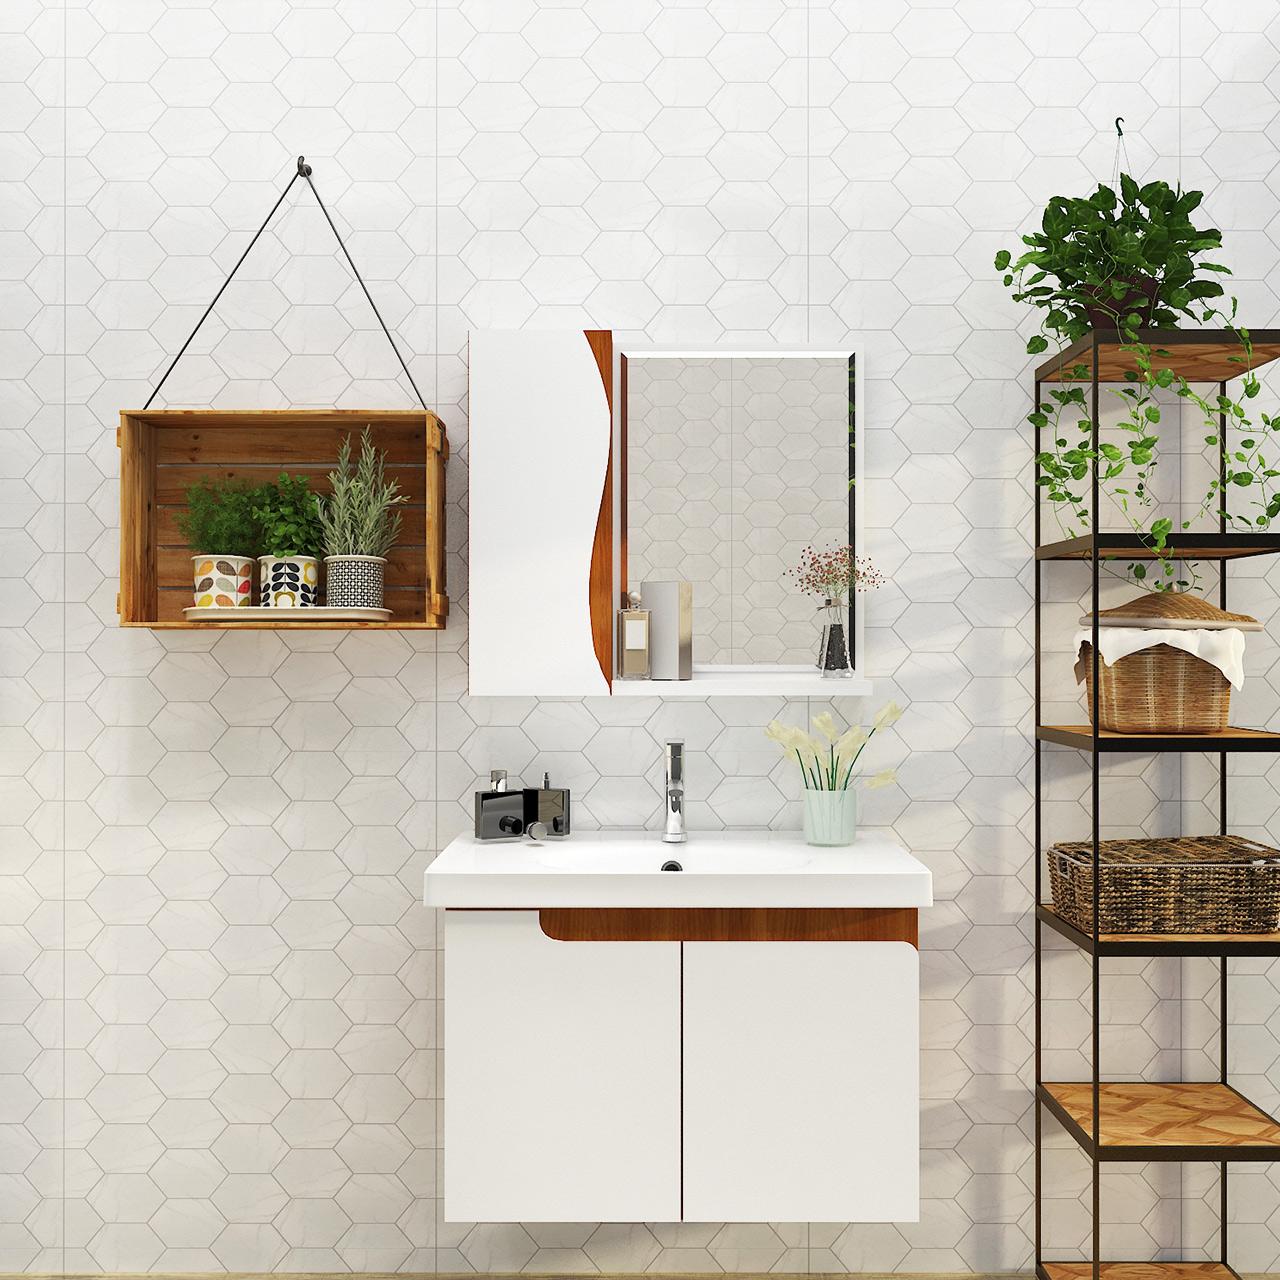 ARROW箭牌卫浴现代轻奢欧式挂墙式浴室柜淋浴花洒套装卫生间组合